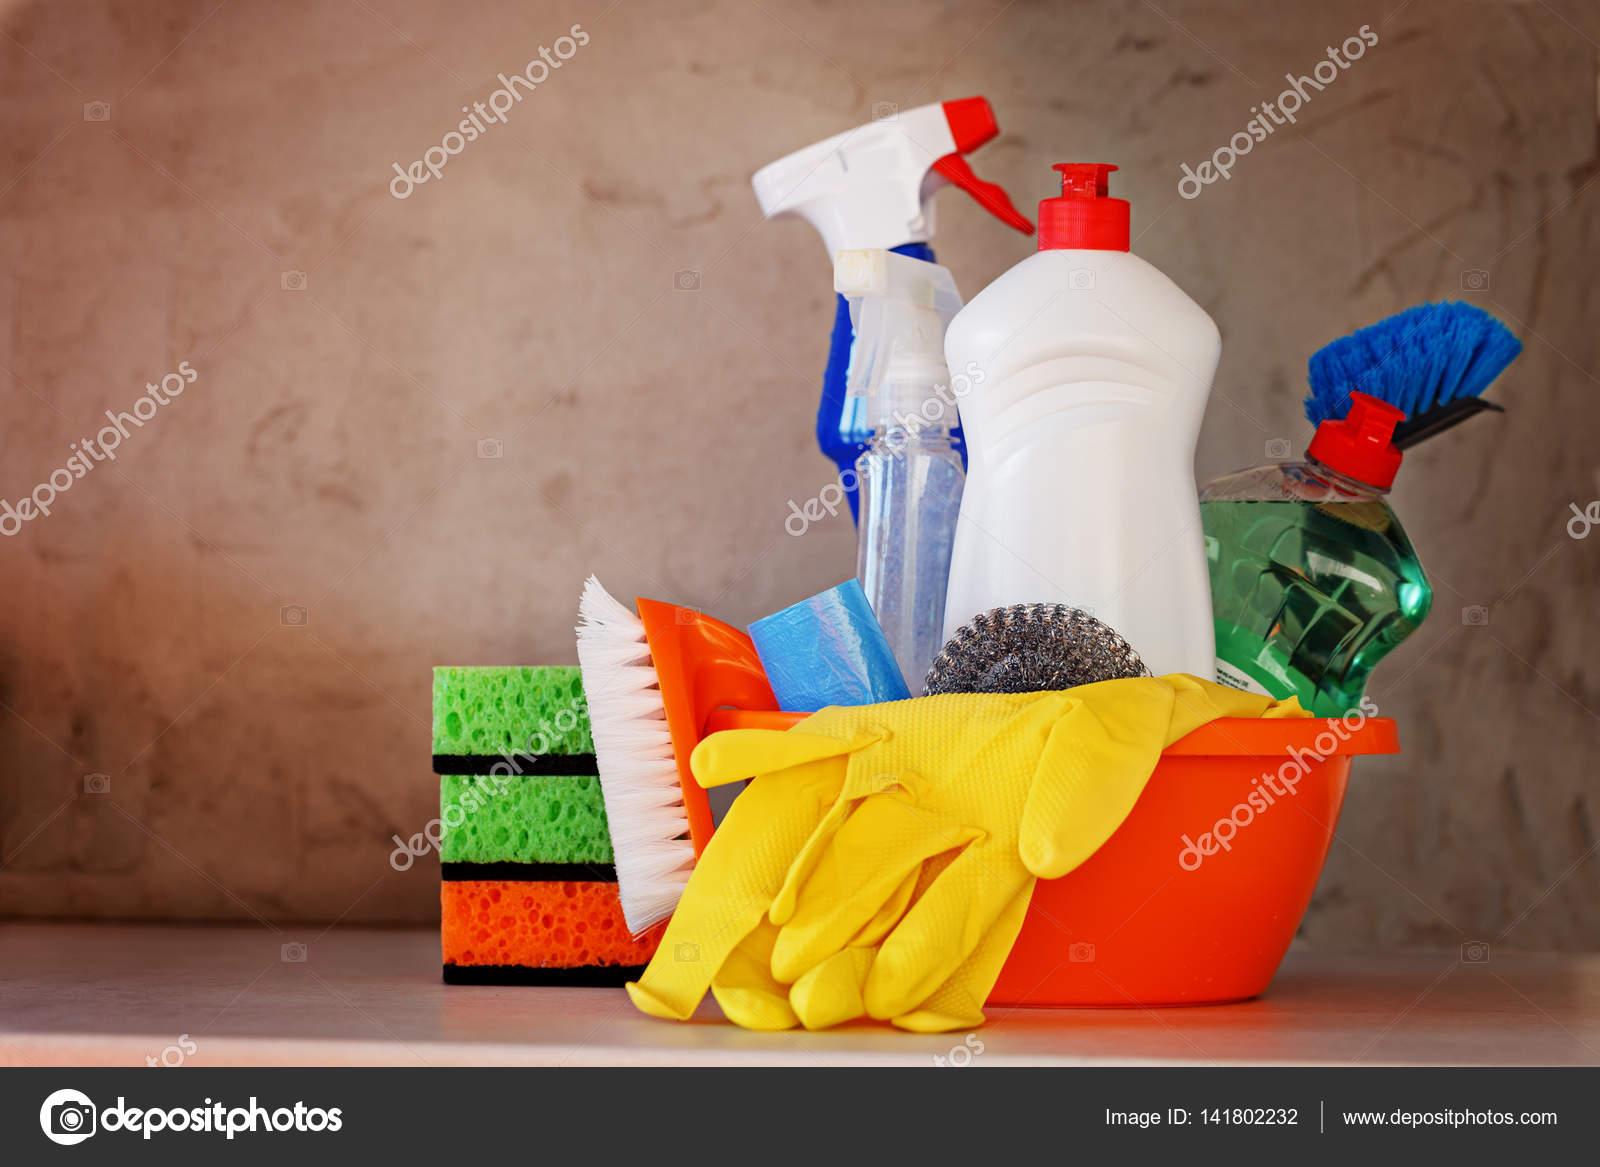 kitchen tables sets popular paint colors for kitchens 提供的产品和用品的厨房桌子上的清洁套 图库照片 c zaikina 141802232